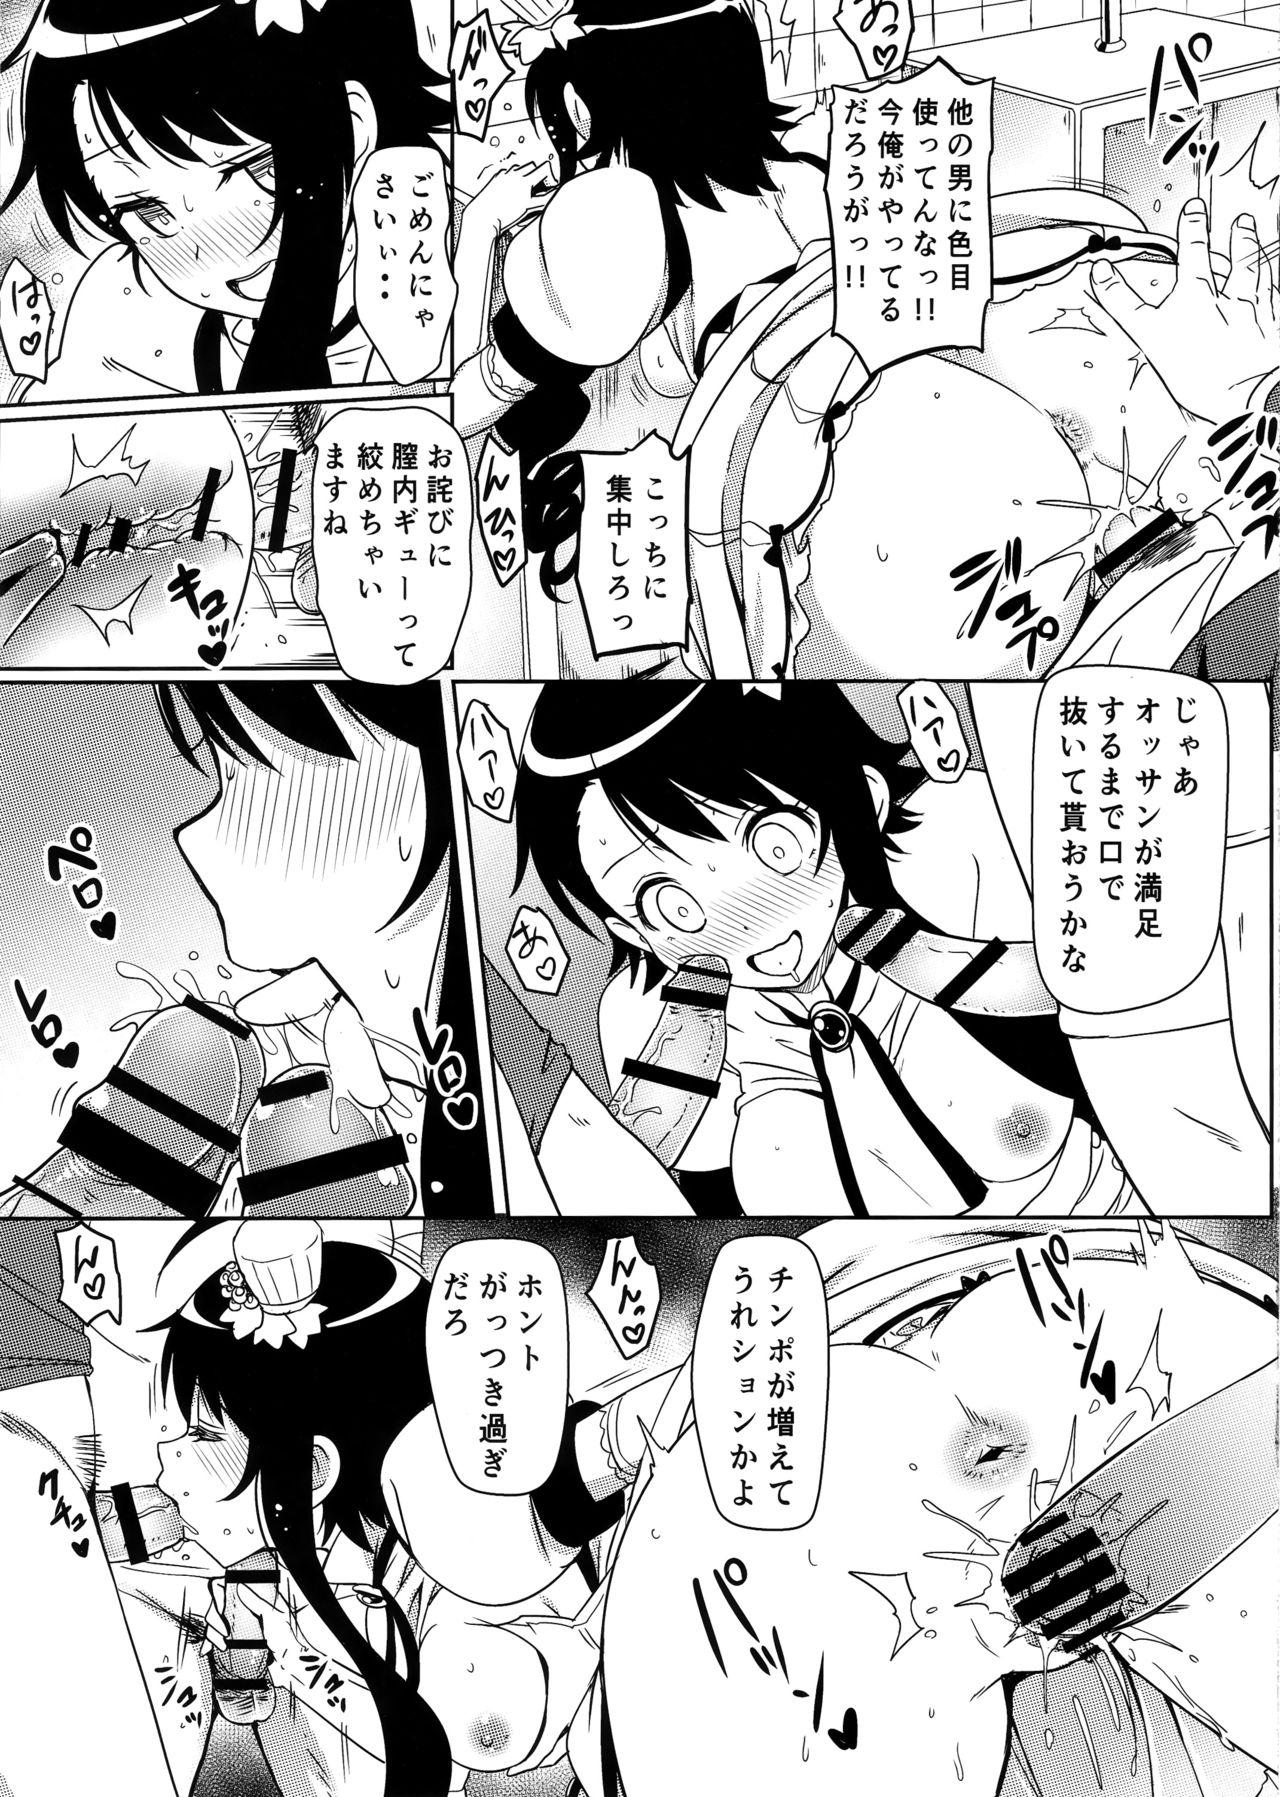 (C96) [Kaminari-neko (Eitarou)] Yamikoi -Saimin- 4 (Nisekoi) 7